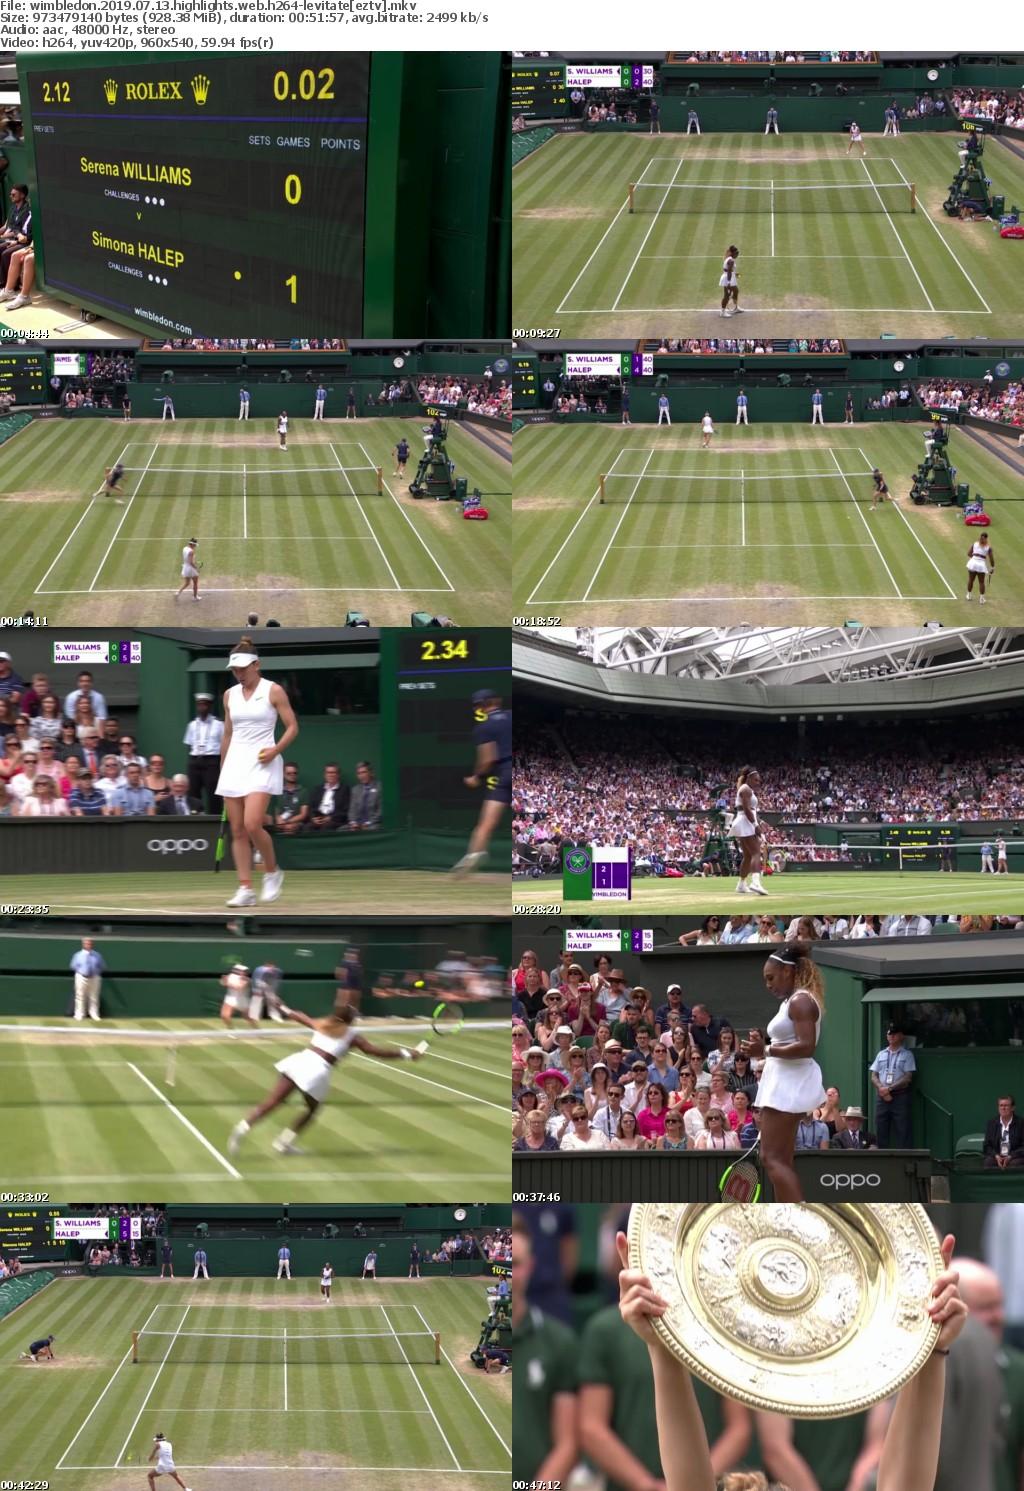 Wimbledon 2019 07 13 Highlights WEB H264 LEViTATE